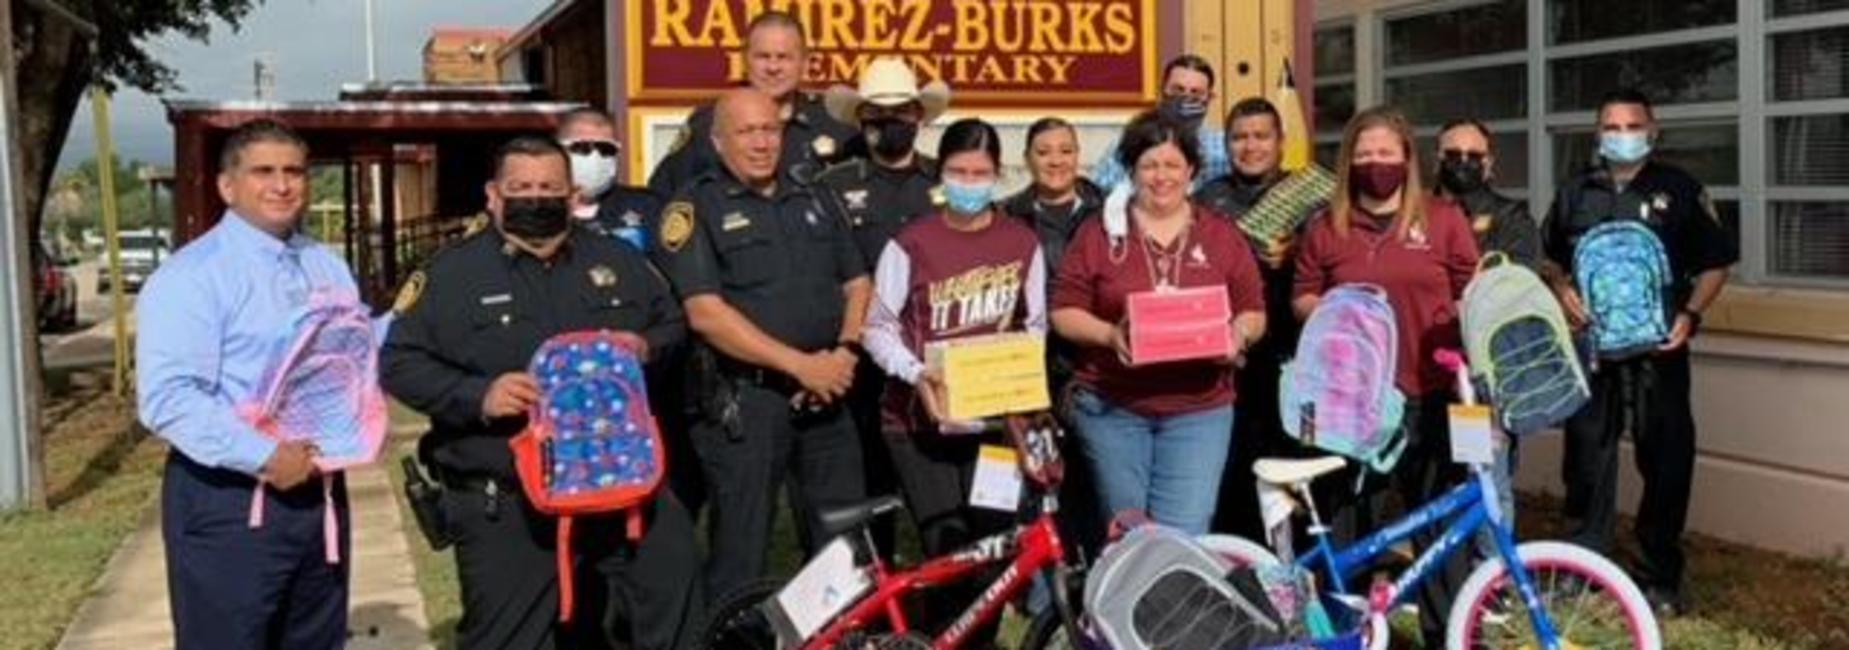 Backpack and Bike Donation People: Superintendent, Captain Mirelez, Deputy Macias, SRO Gonzales, Chief Romo, Sheriff Zertuche, Amanda Carbajal, Inv. Sobrevilla, Cpl. Avila, Mary Jean, Deputy Gamino